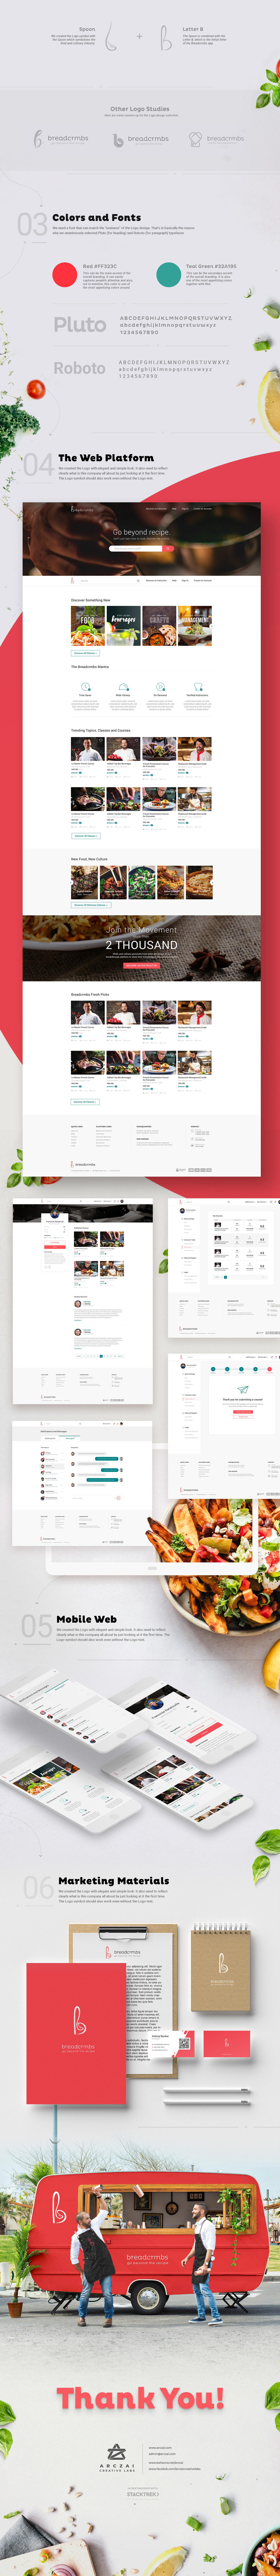 Website design cooking Culinary Video Sharing Platform creative UI ux inspiration